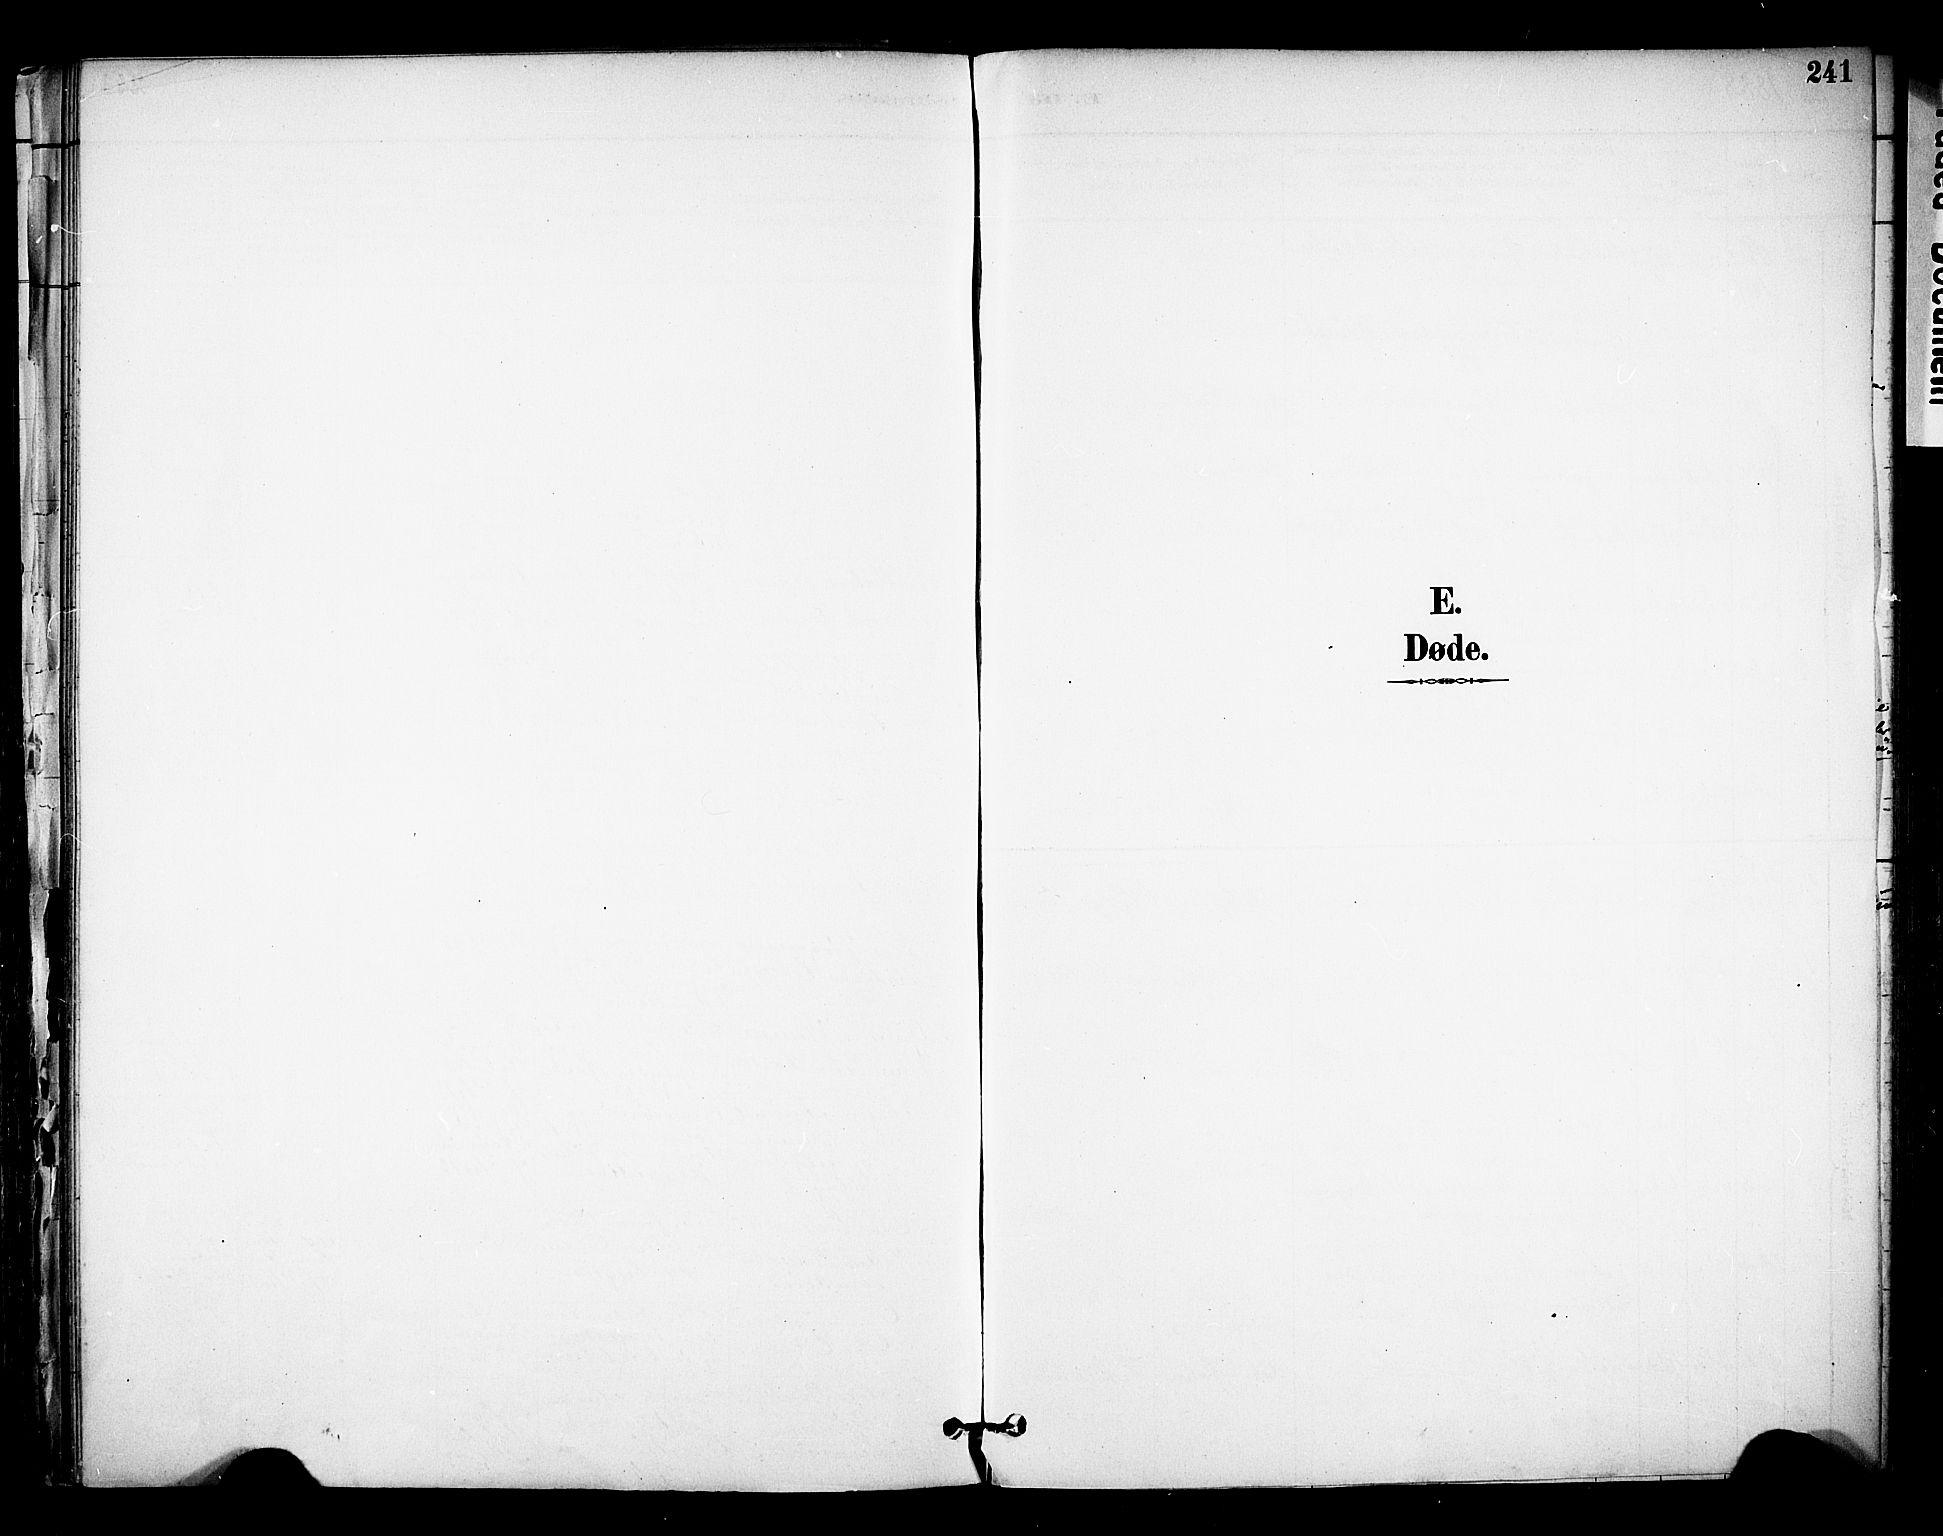 SAKO, Solum kirkebøker, F/Fa/L0010: Ministerialbok nr. I 10, 1888-1898, s. 241